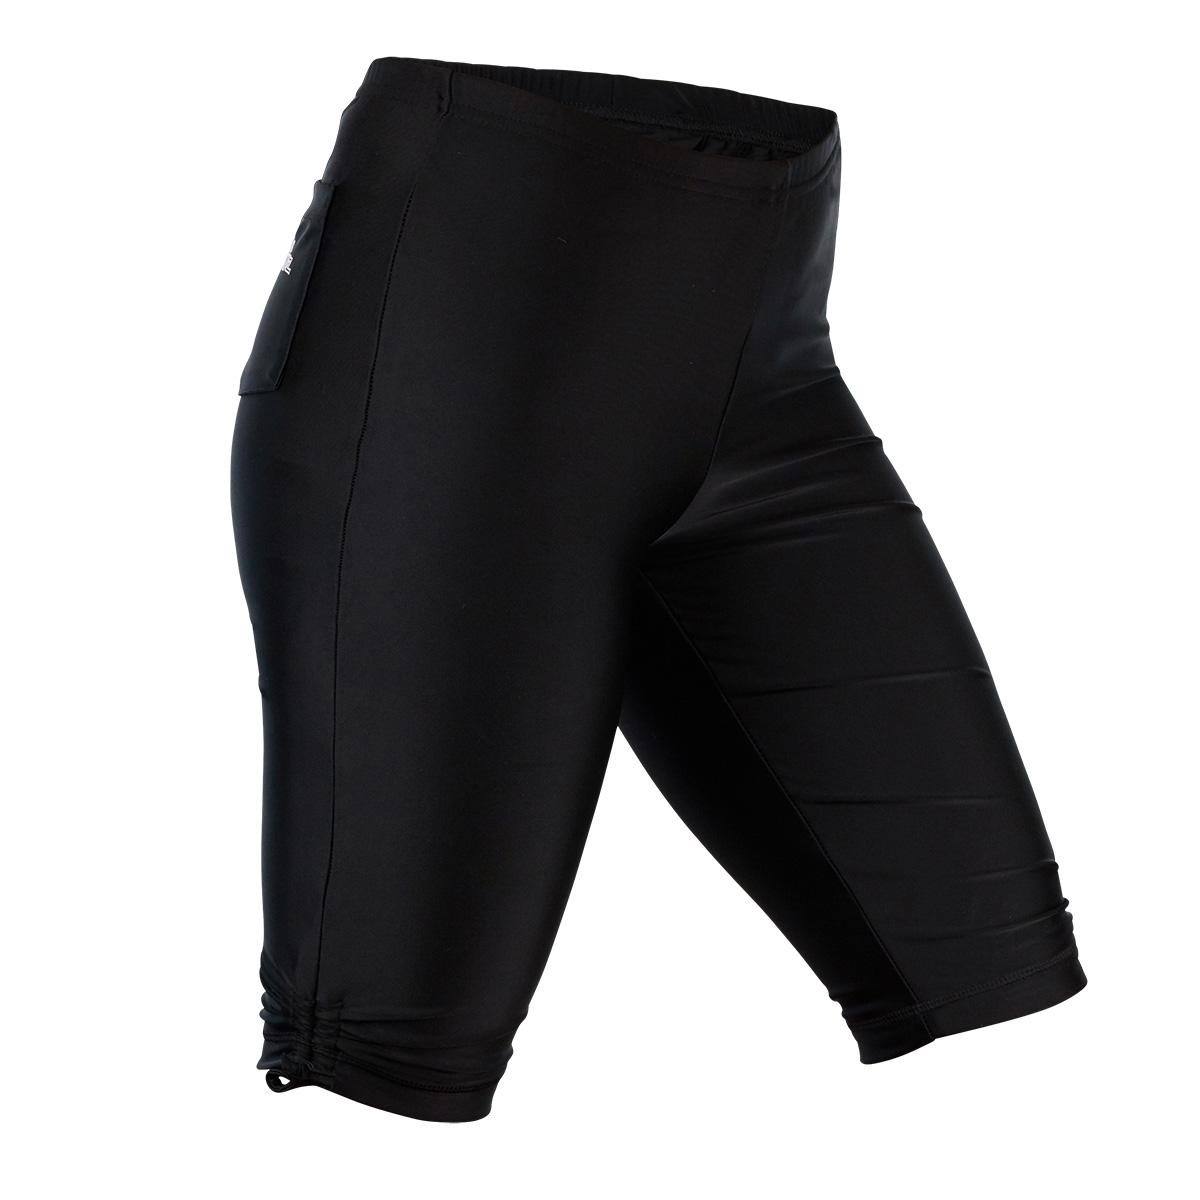 womens swim shorts summer beach bottoms swimwear for women - spf/upf 50+ FAHZPAS